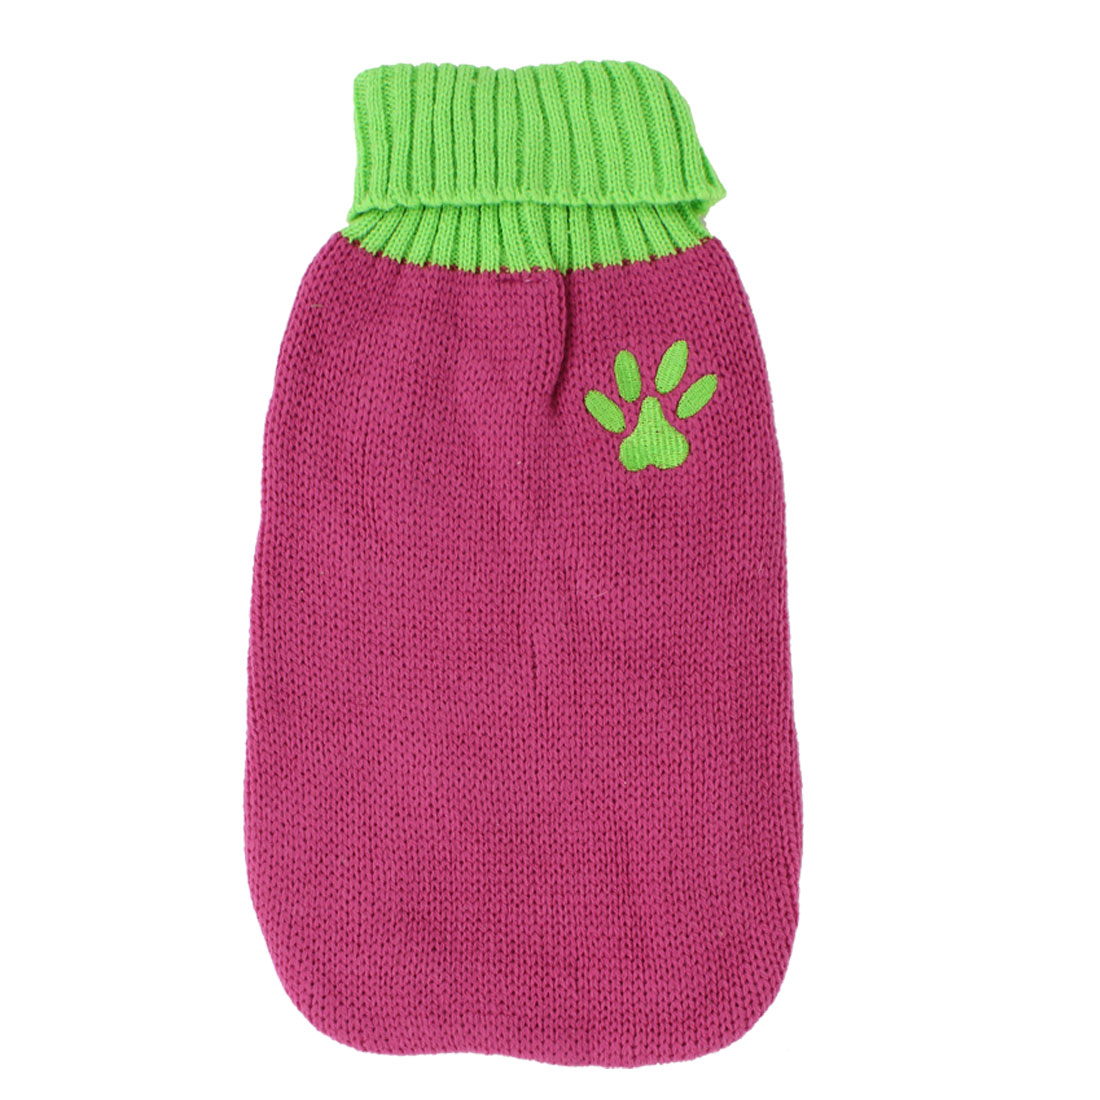 Pet Dog Doggy Ribbed Cuff Knitwear Turtleneck Apparel Sweater Fuchsia Green M